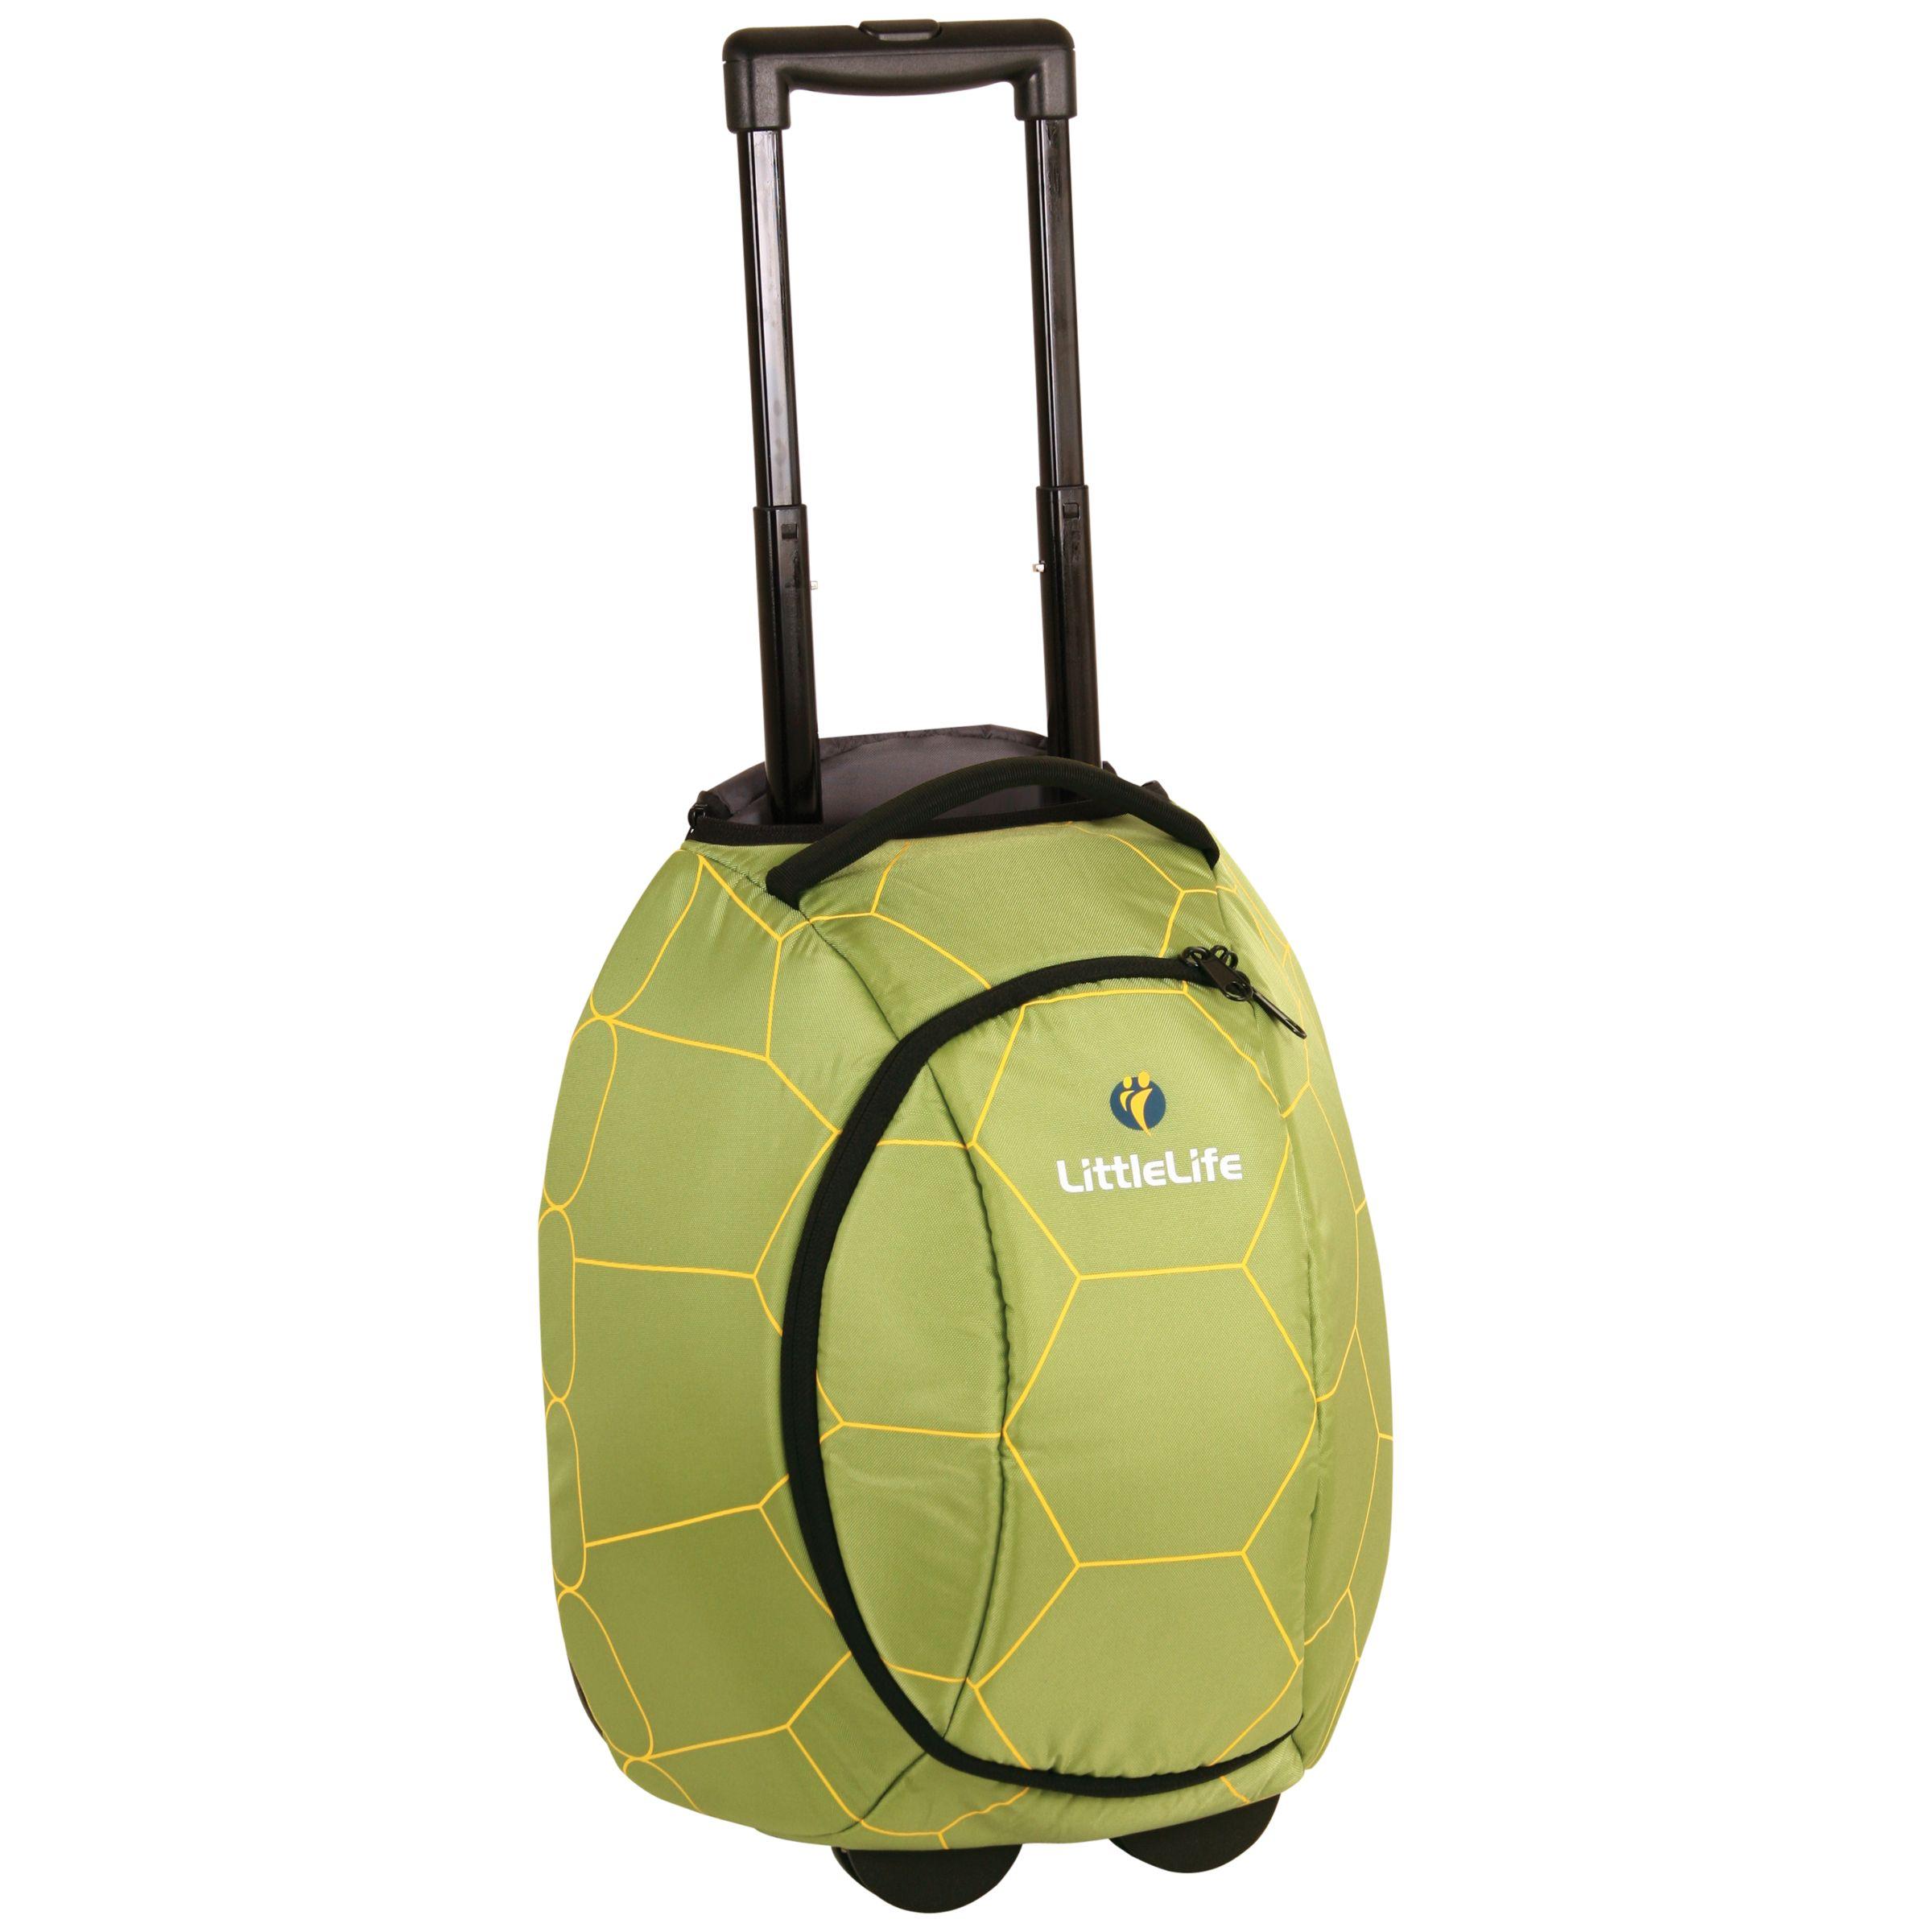 Littlelife LittleLife Turtle Wheelie Bag, Green